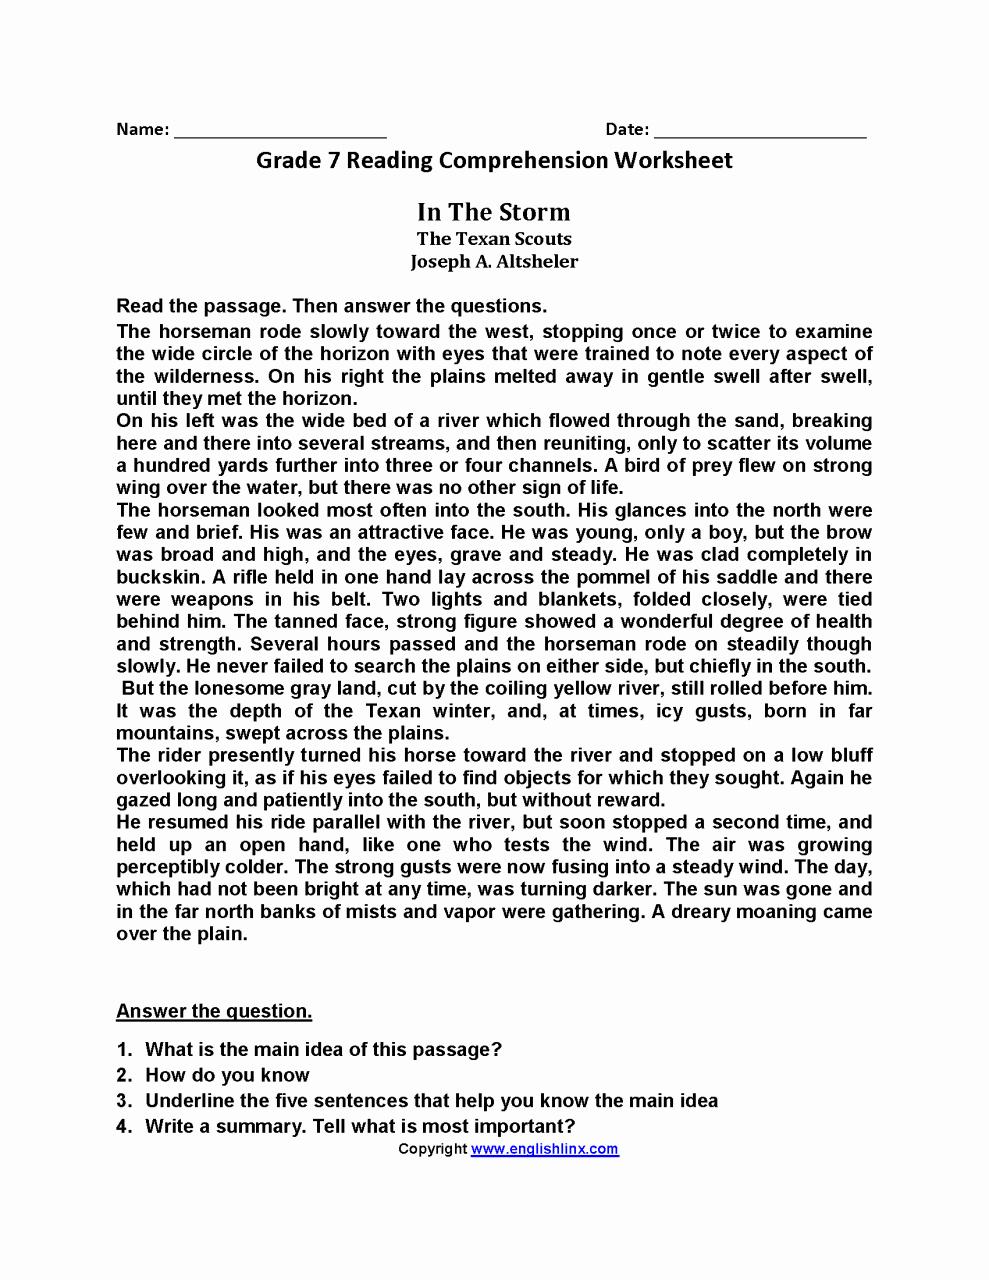 7th Grade Grammar Worksheets Pdf Best Of 7th Grade Grade 7 English Worksheets Pdf Kidsworksheetfun